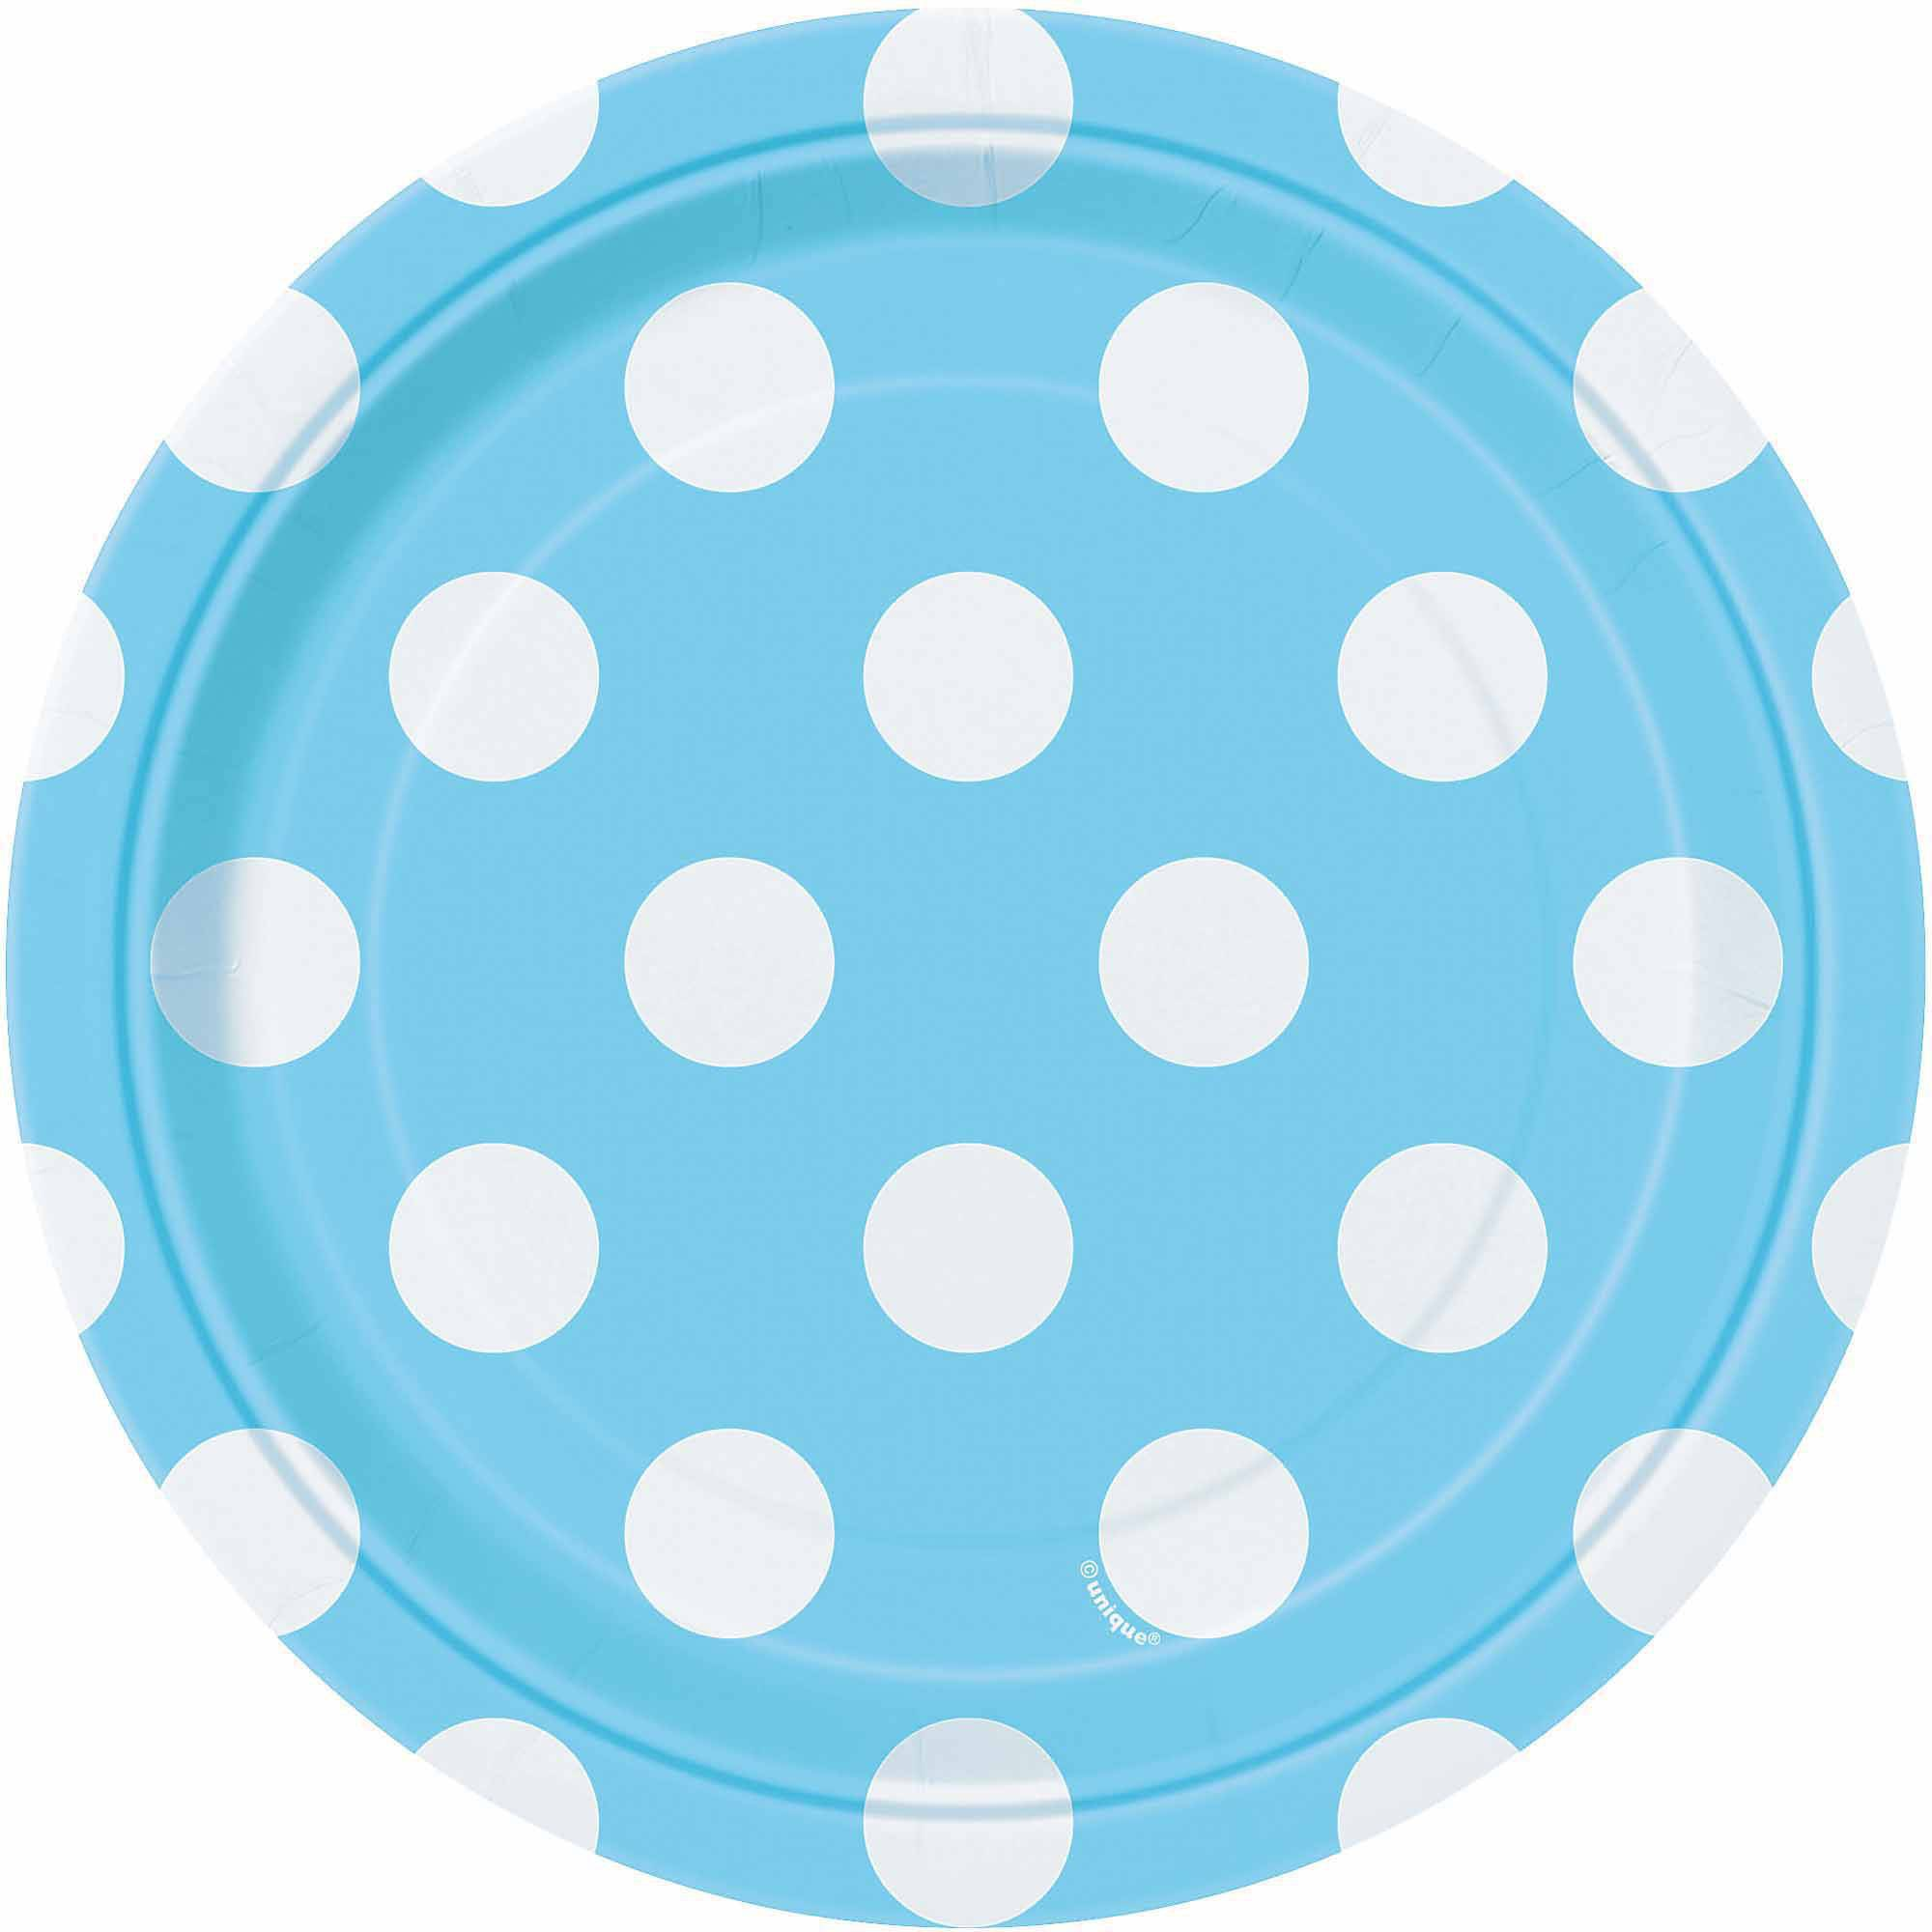 "7"" Polka Dot Paper Dessert Plates, Light Blue, 8ct"